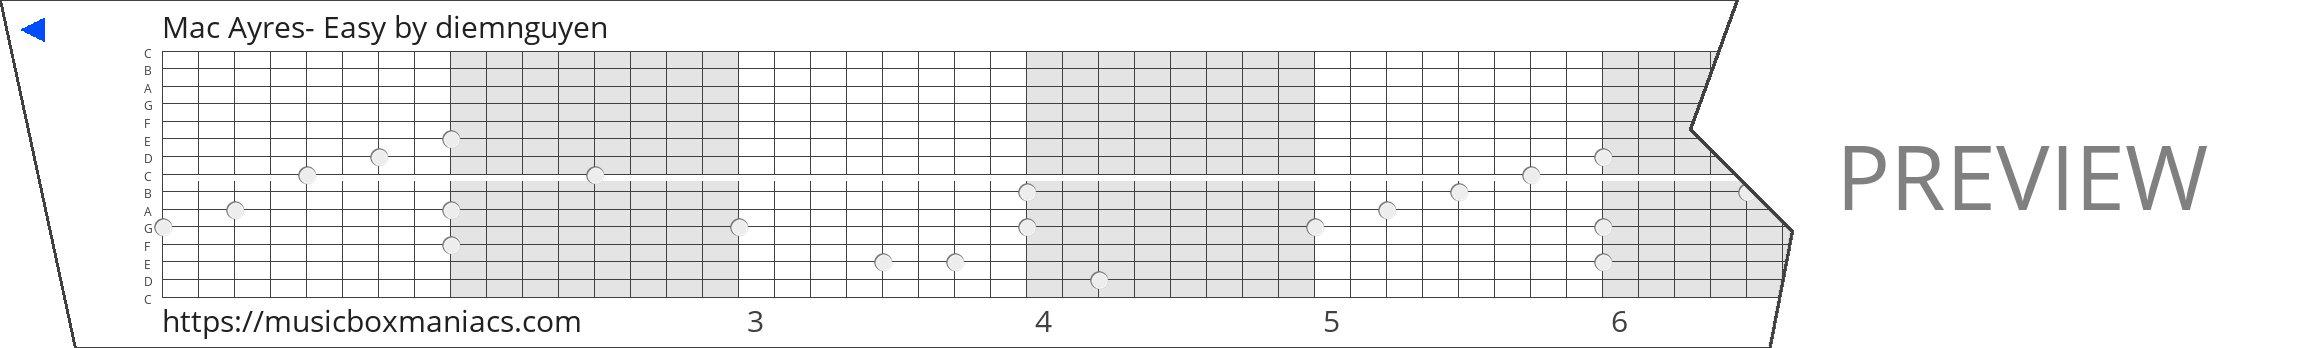 Mac Ayres- Easy 15 note music box paper strip